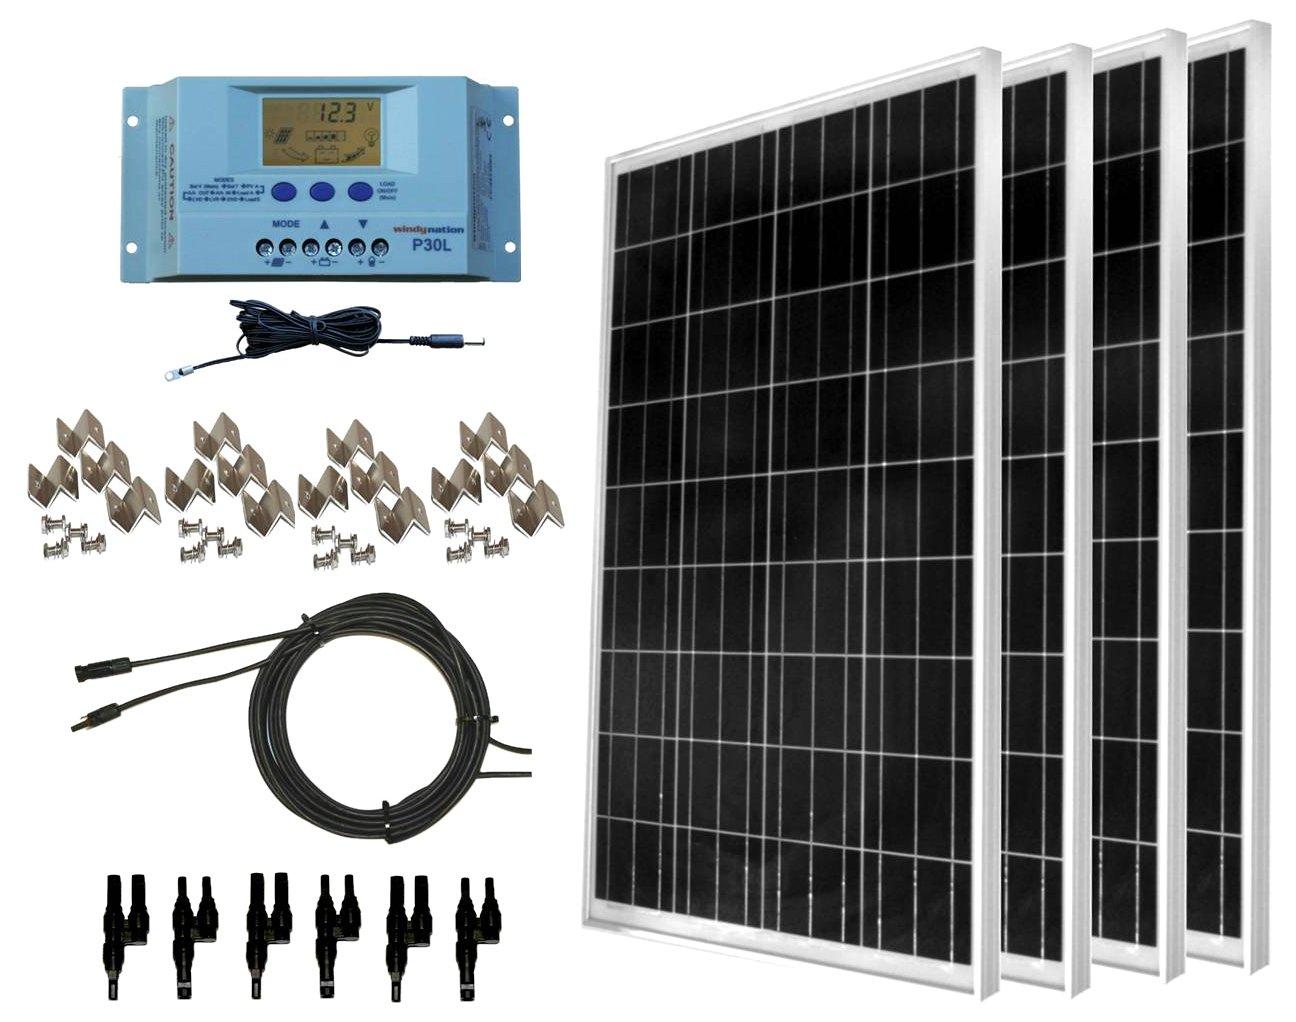 Wiring Solar Panels Series Or Parallel Windynation Community Panel Vs Amazon Com 400 Watt Kit 4pcs 100